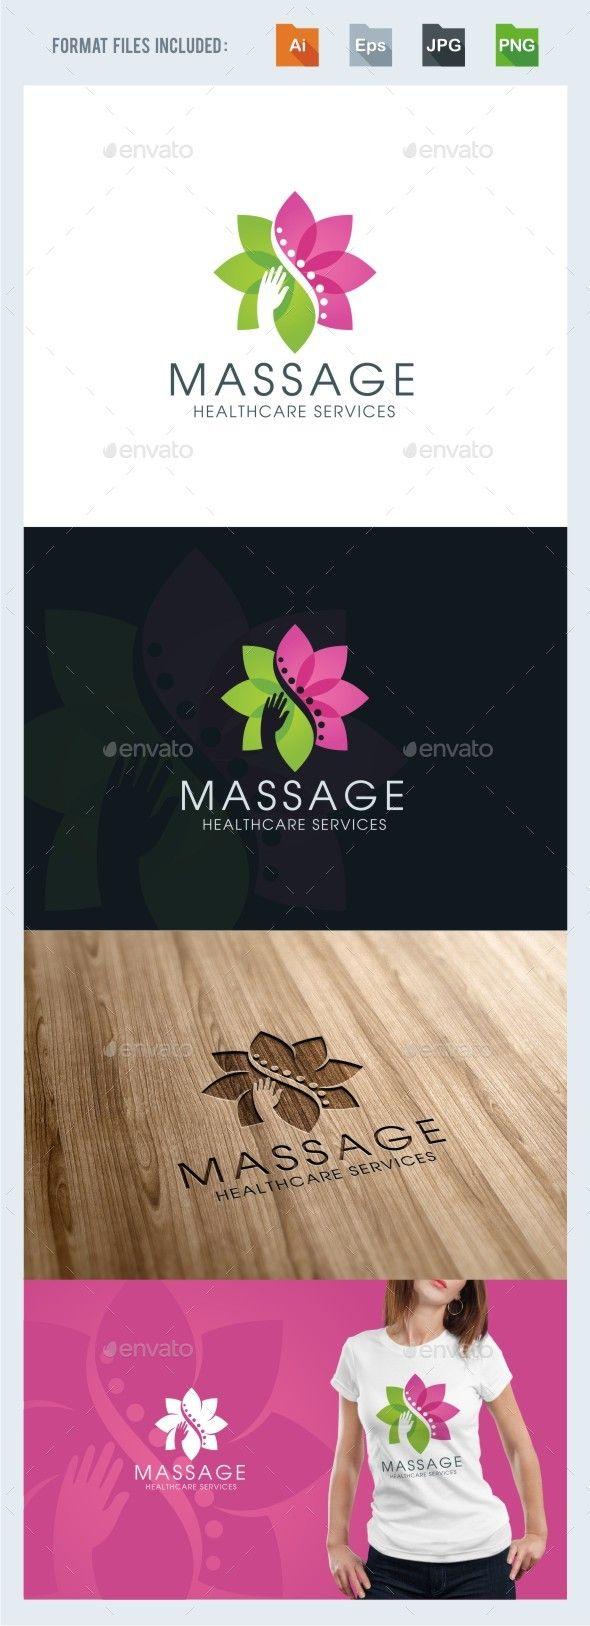 Massage - Chiropractic Logo Design Template - Symbols Logo Templates Eps Vector,...